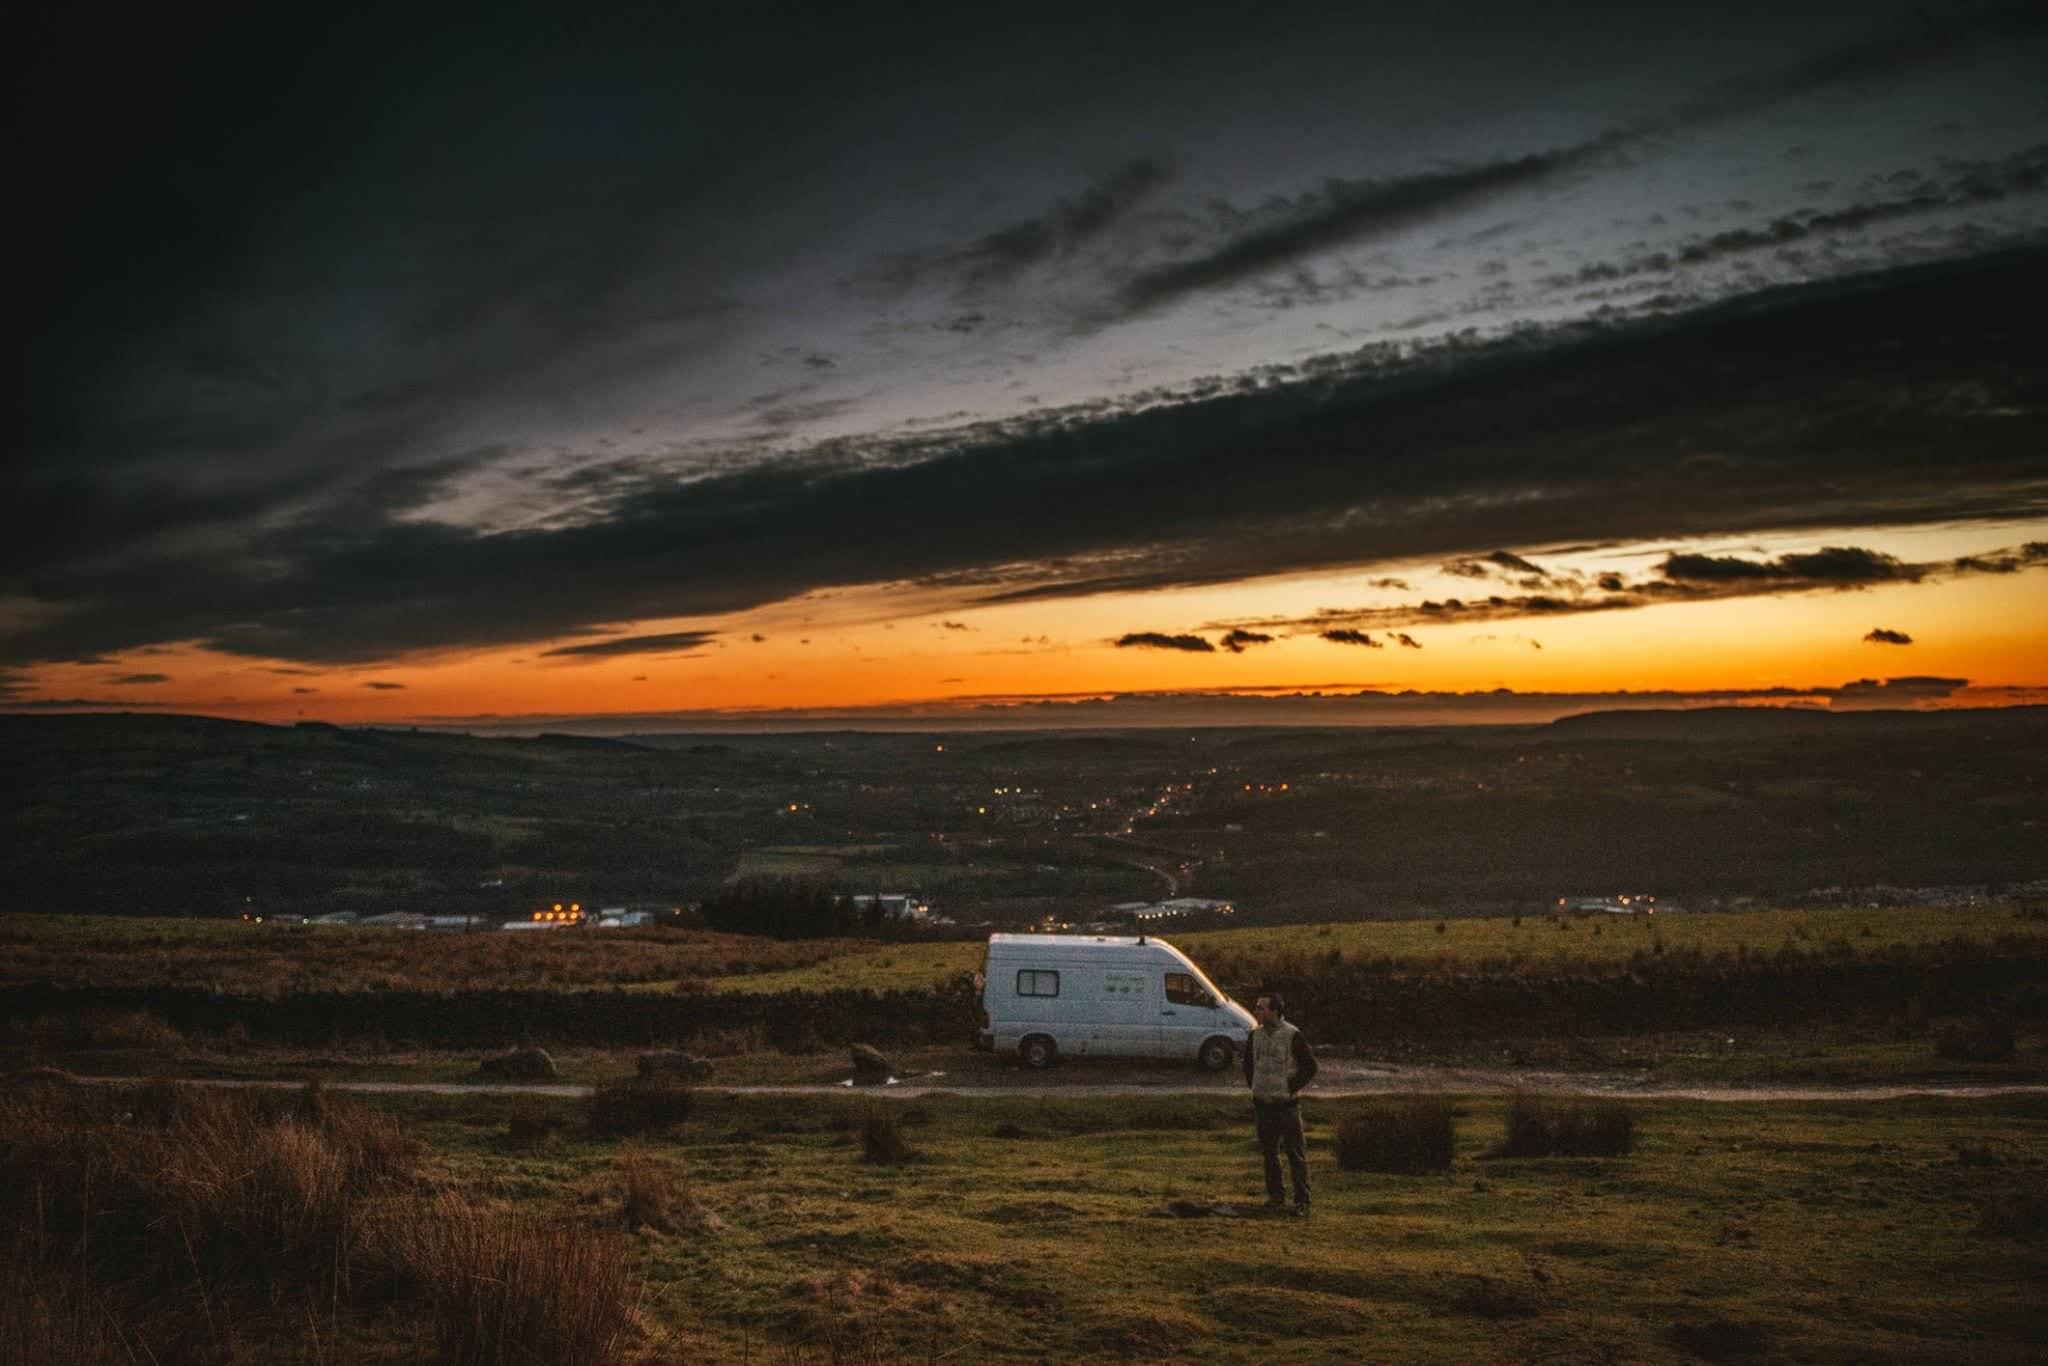 A campervan in Ireland